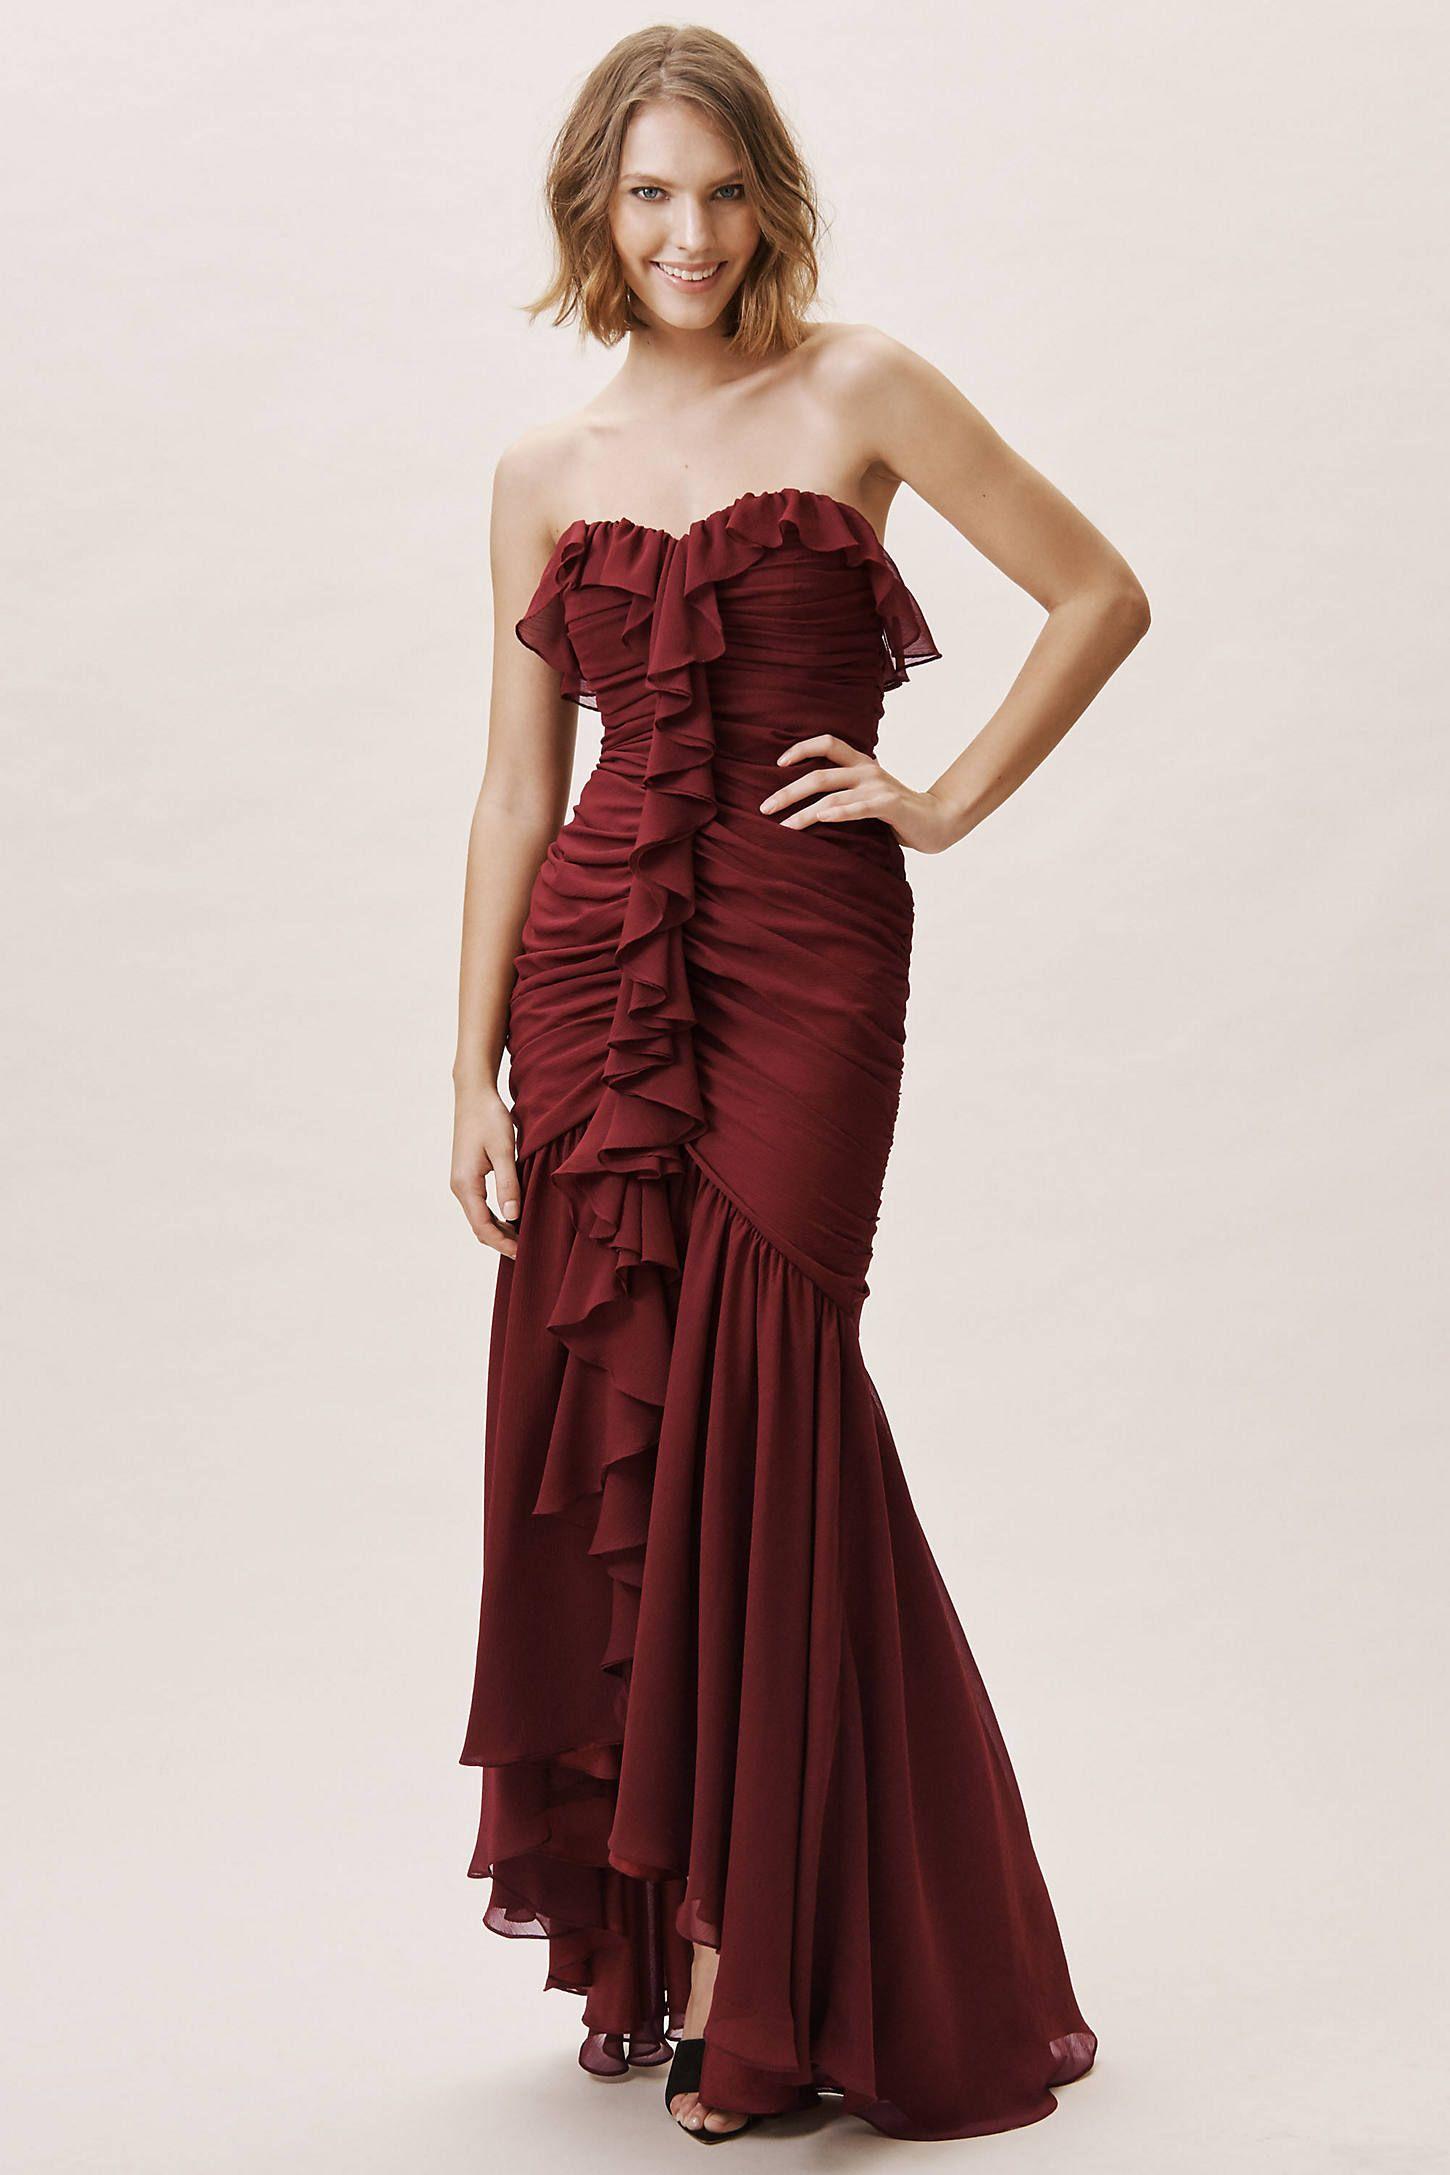 Jill Jill Stuart Jett Wedding Guest Dress Jilljillstuart Cloth Dresses Strapless Dress Formal Wedding Guest Dress [ 2175 x 1450 Pixel ]